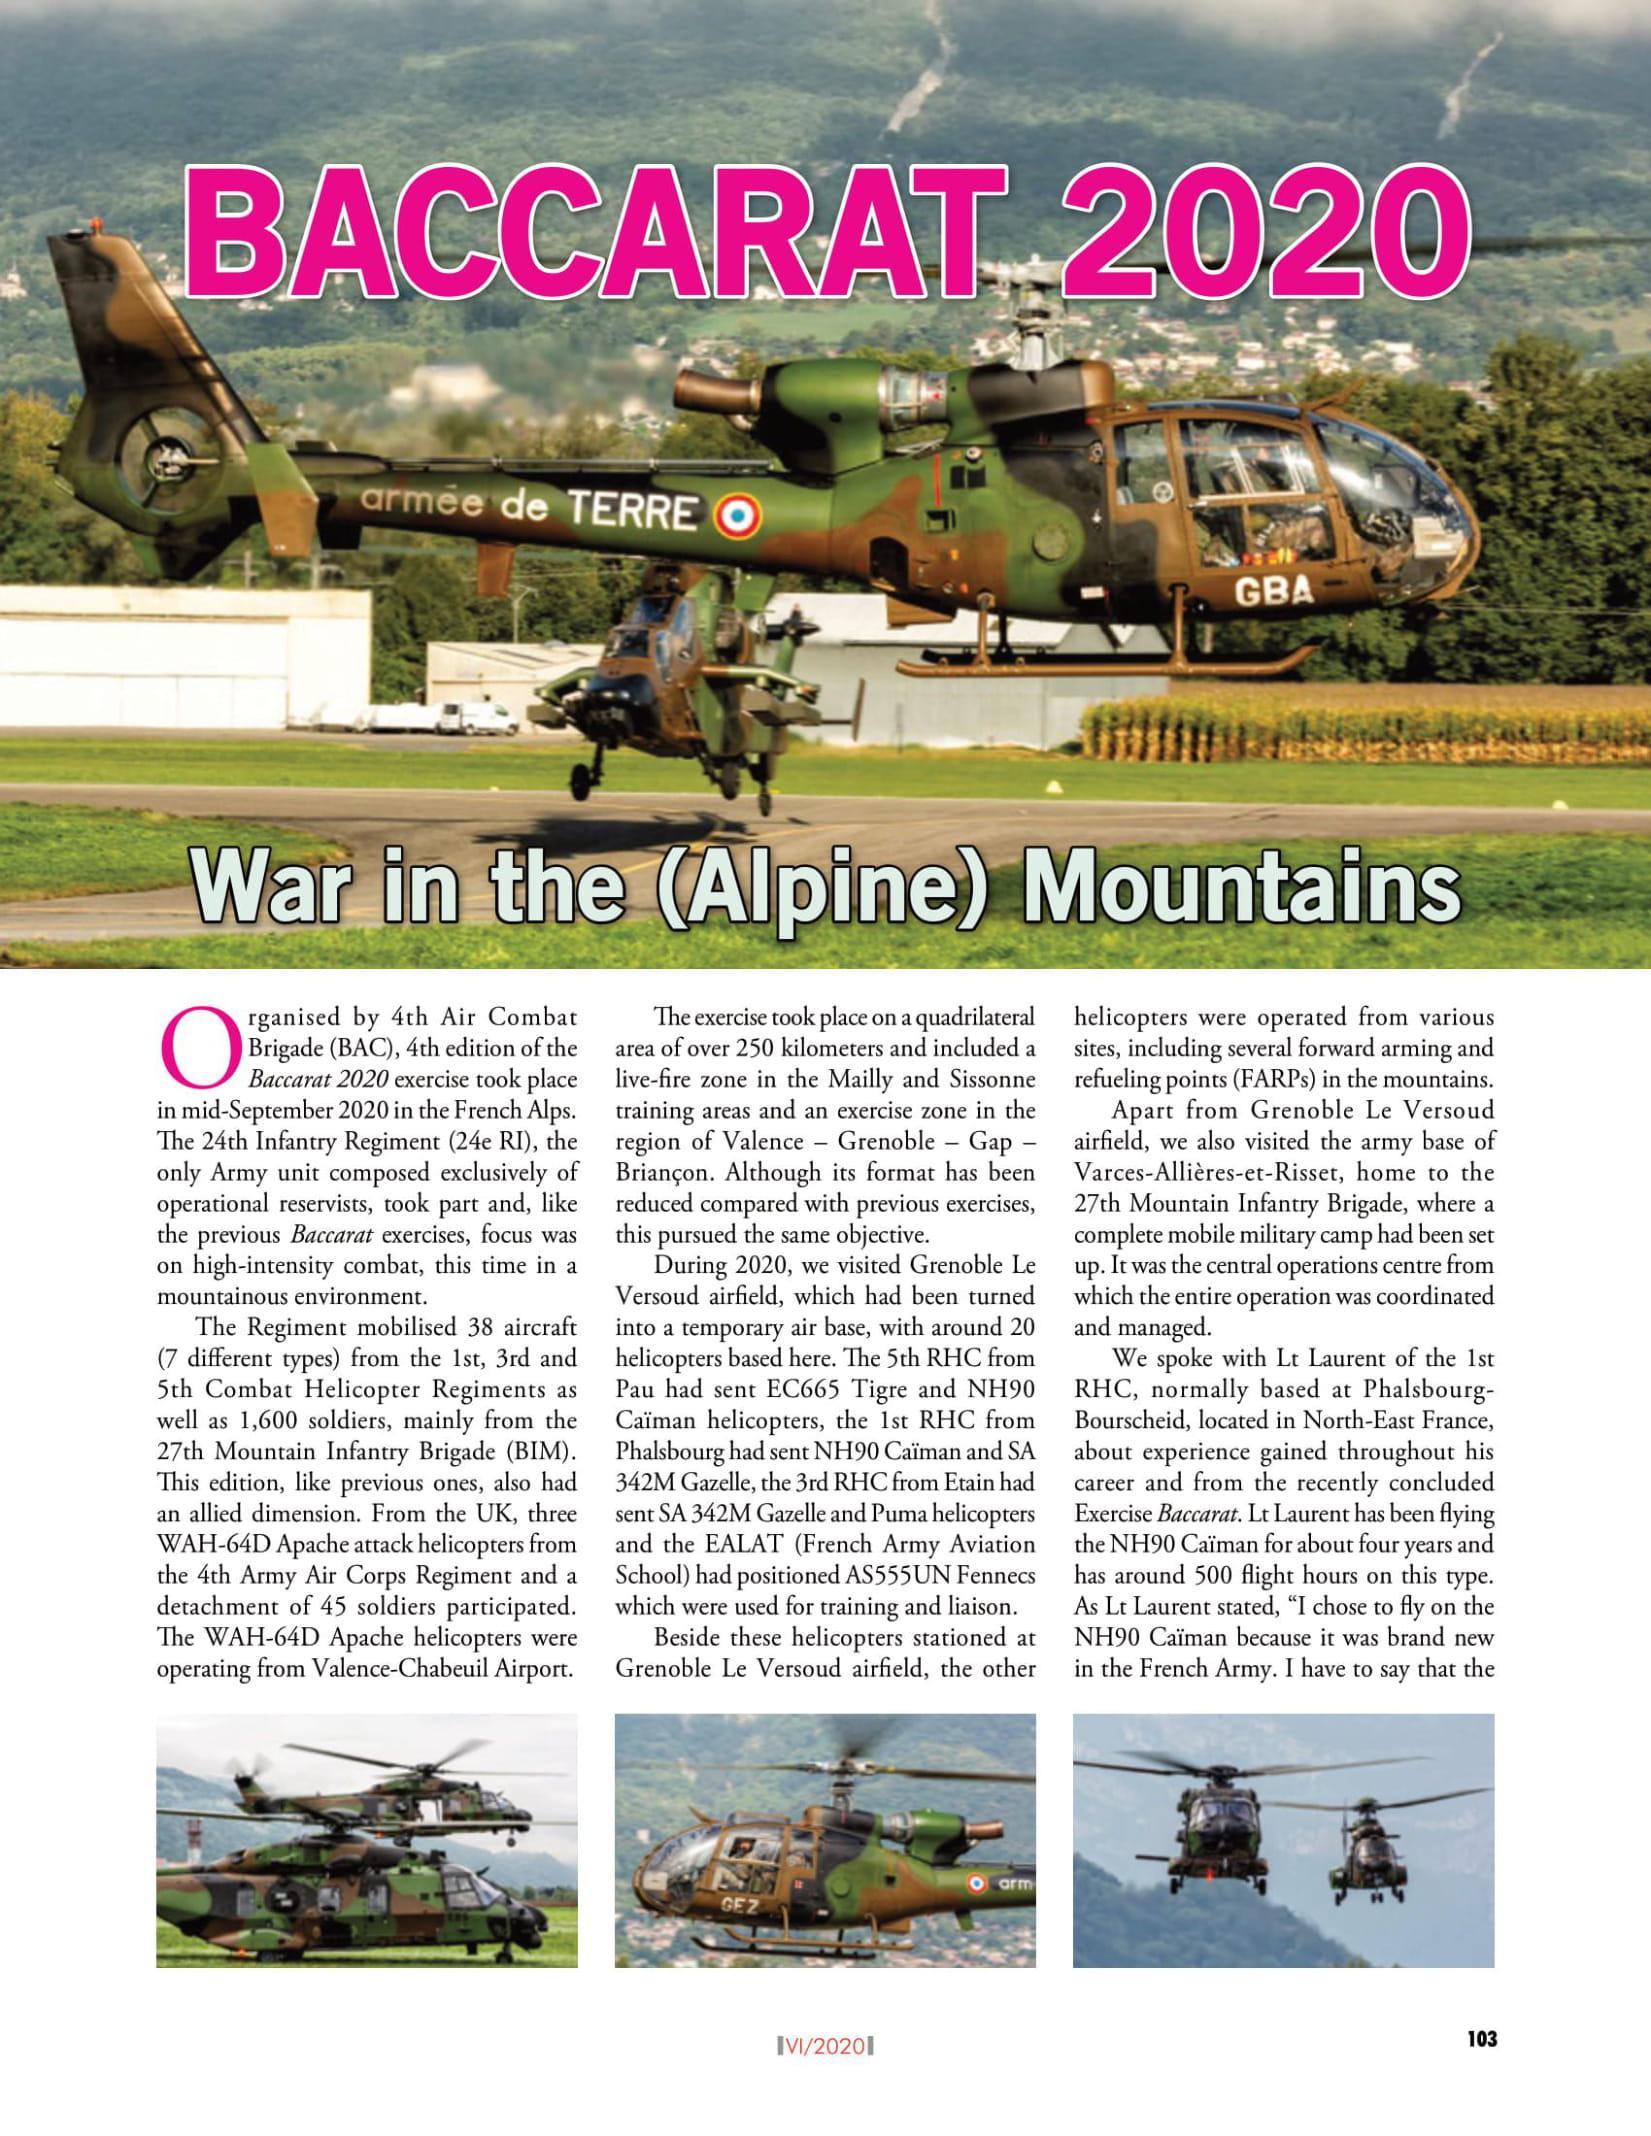 Vayu Aerospace & Defence (India)_Baccarat 2020 (1)-2